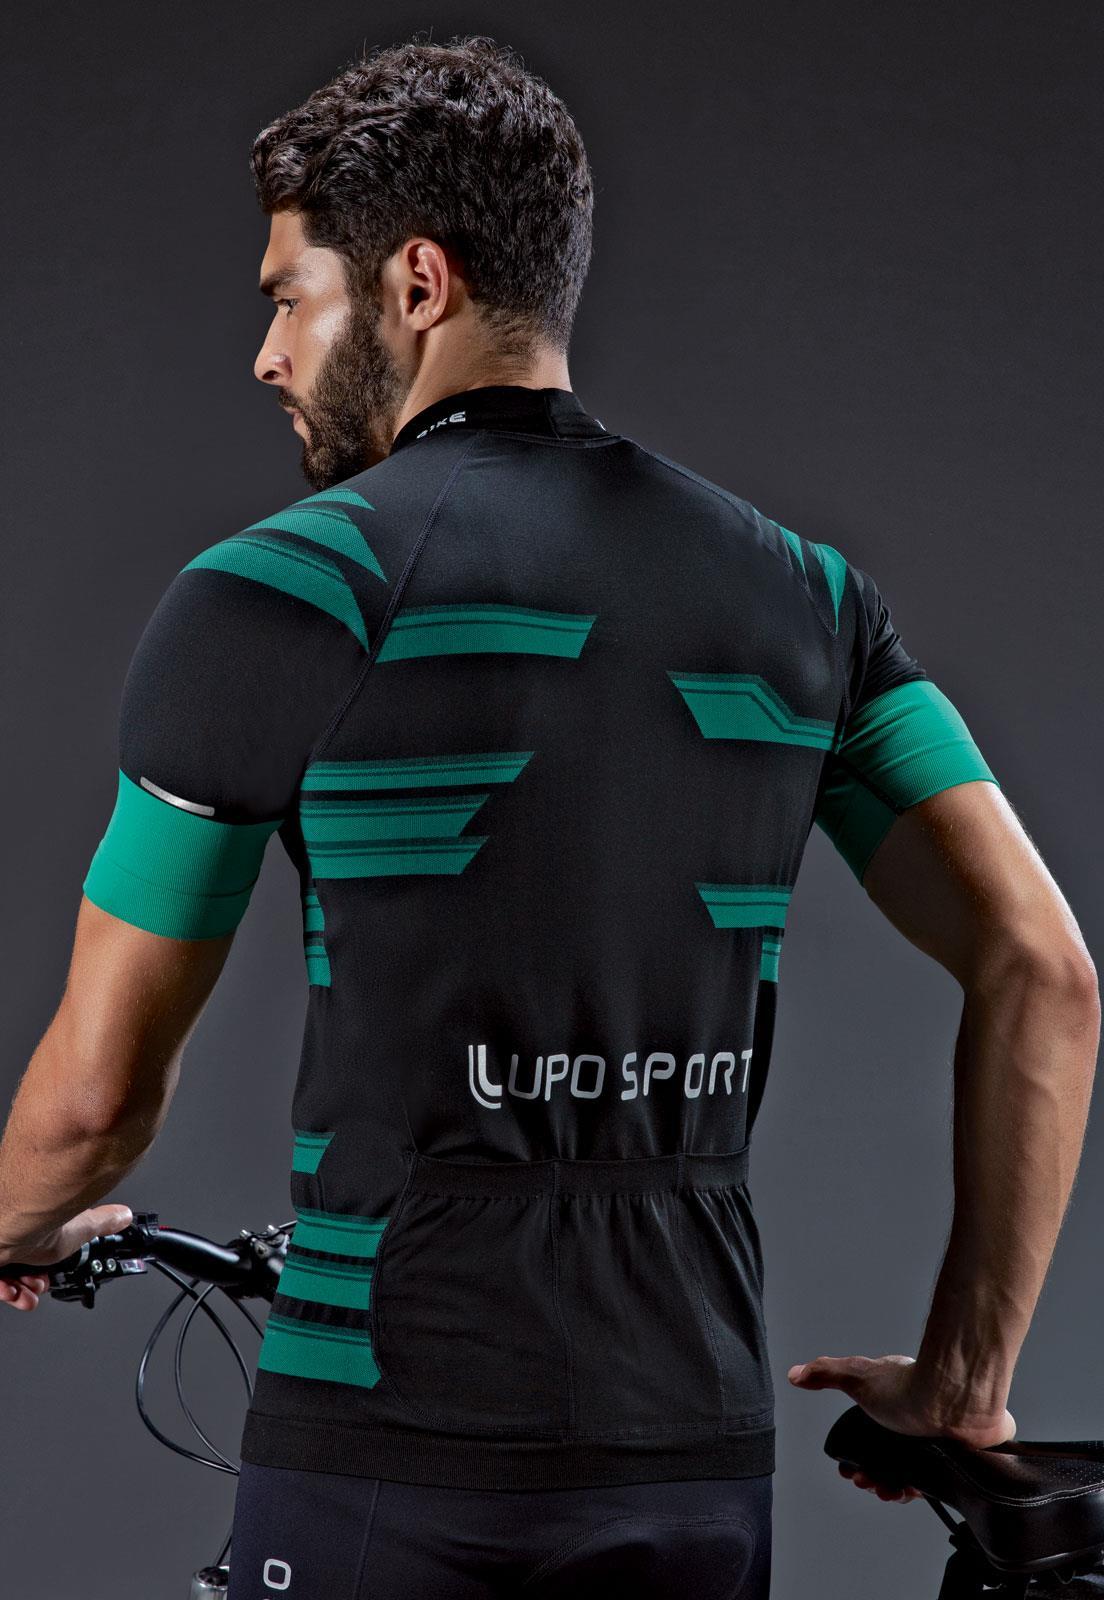 22006fc25 Camiseta Lupo Seamless Dry Bike Lupo Fitness 70665 - Le Lingerie